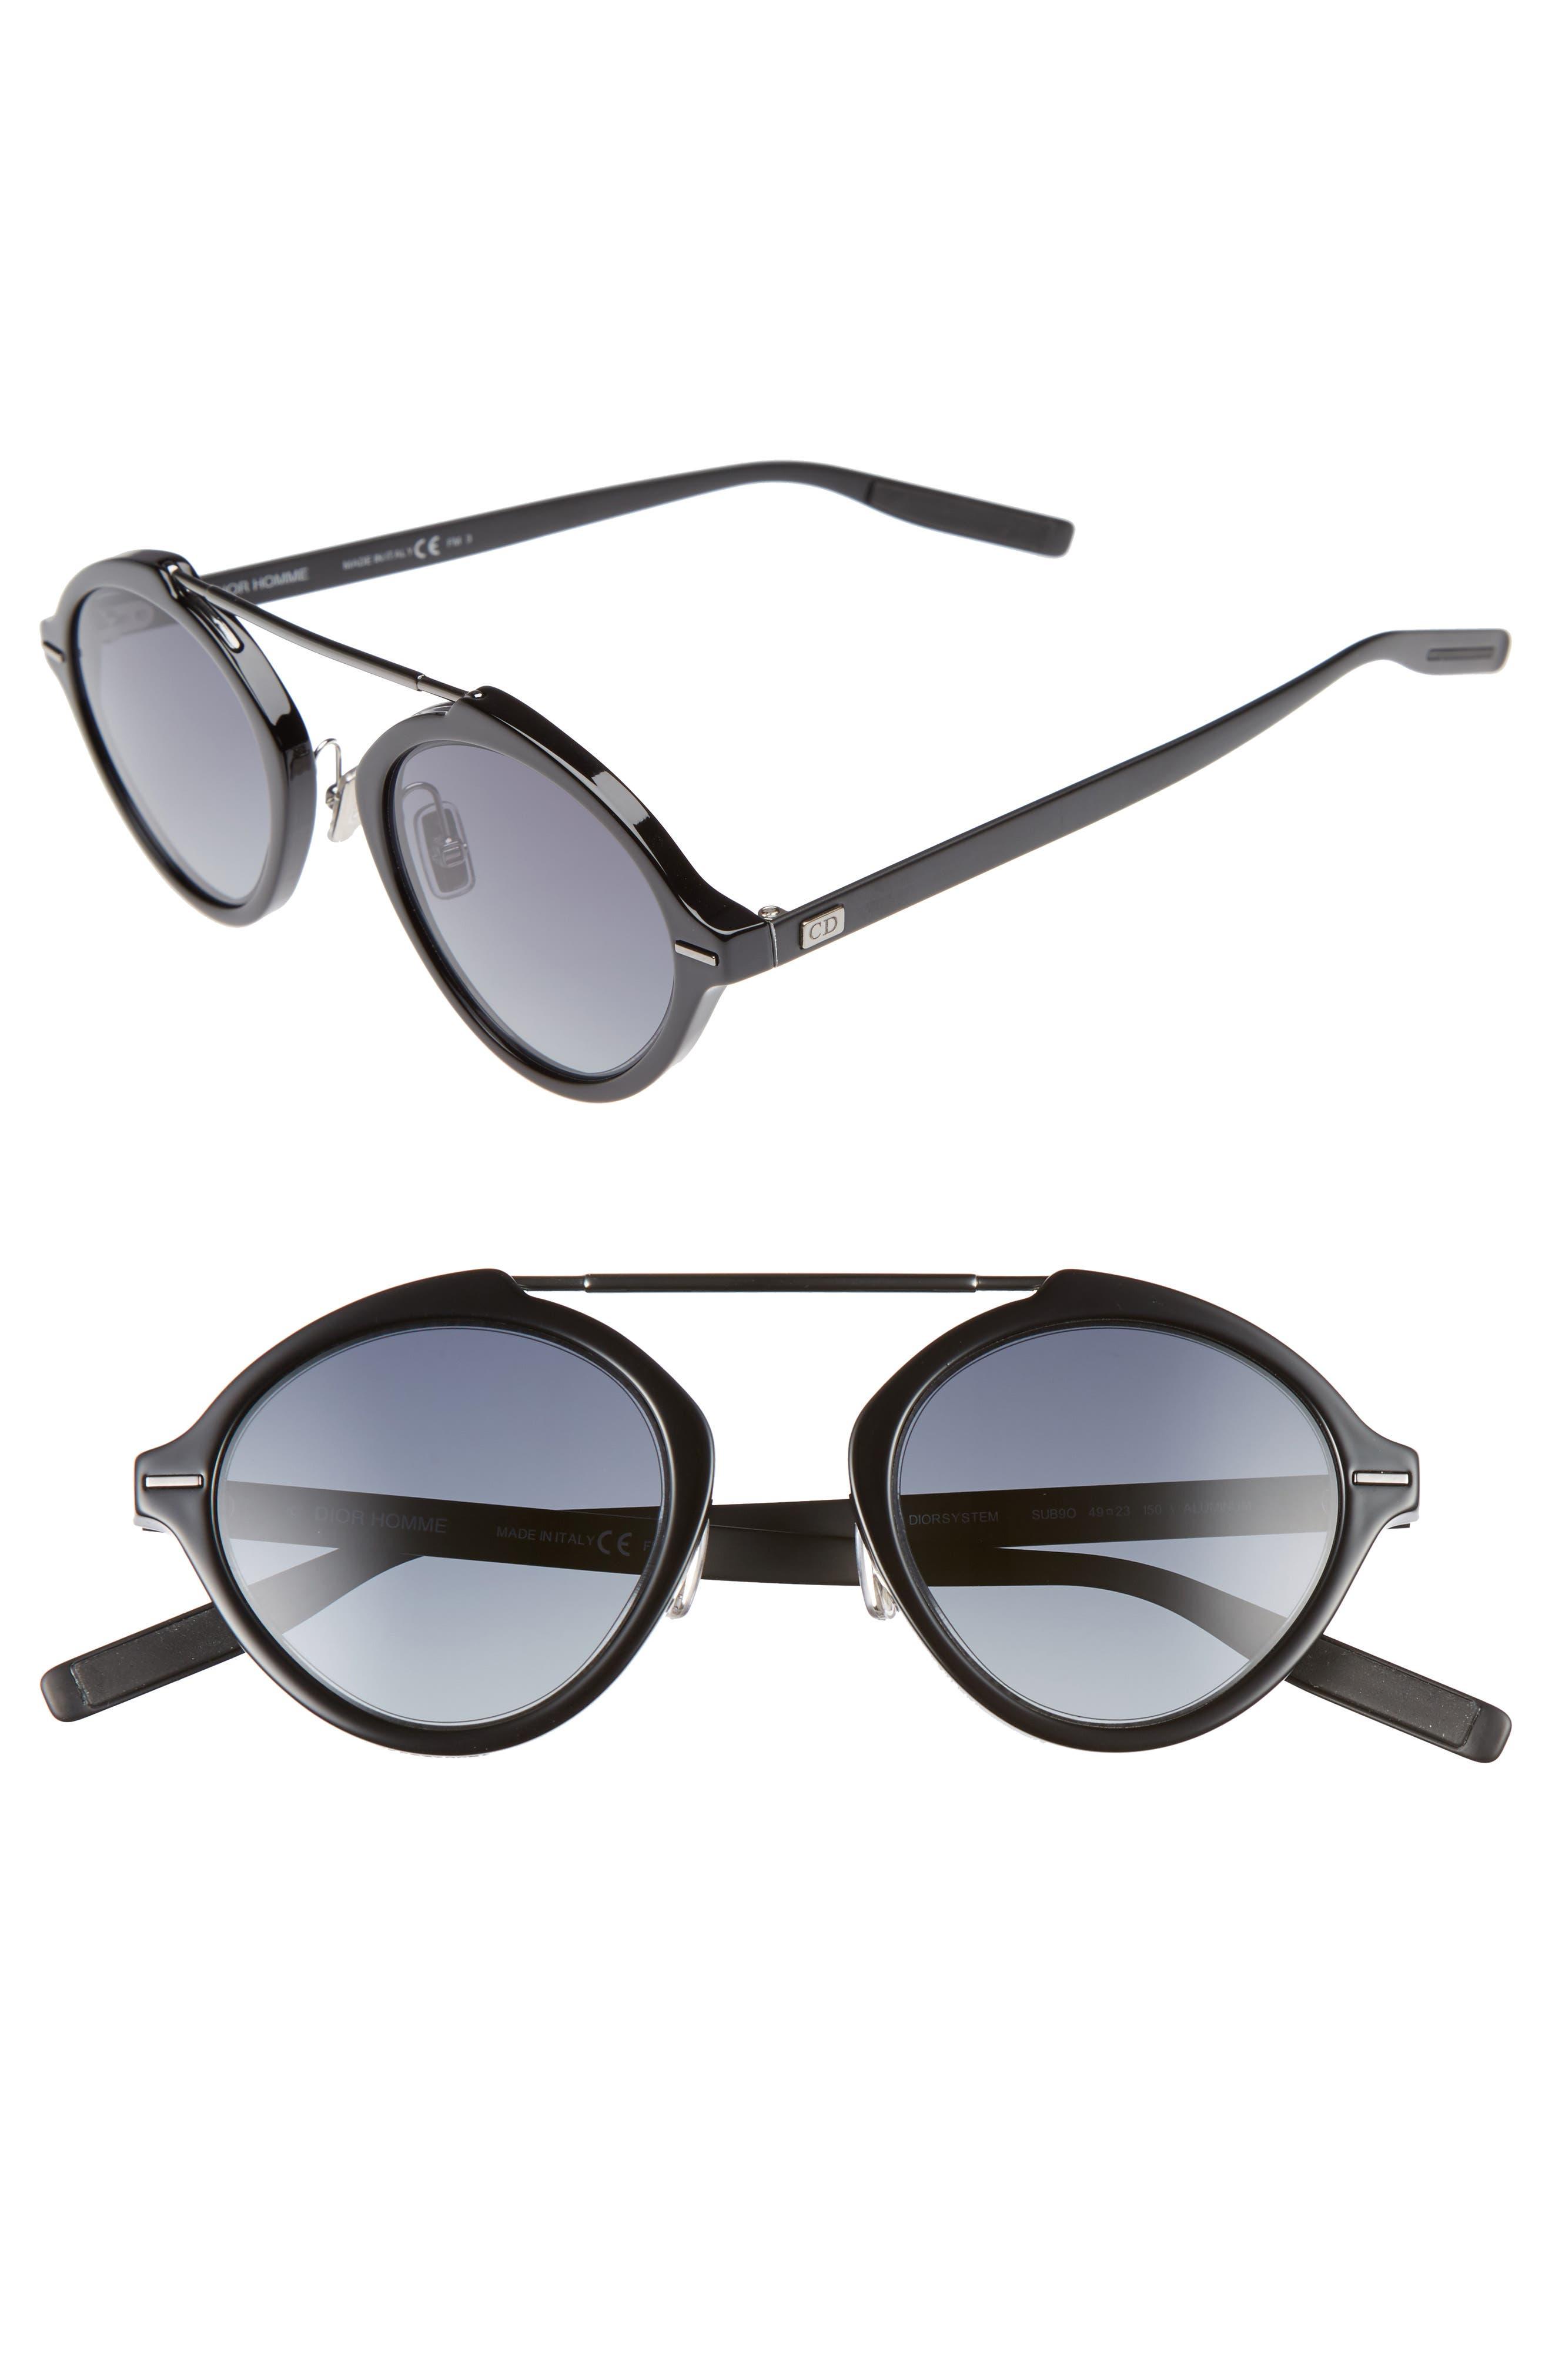 System 49mm Sunglasses,                             Main thumbnail 1, color,                             001